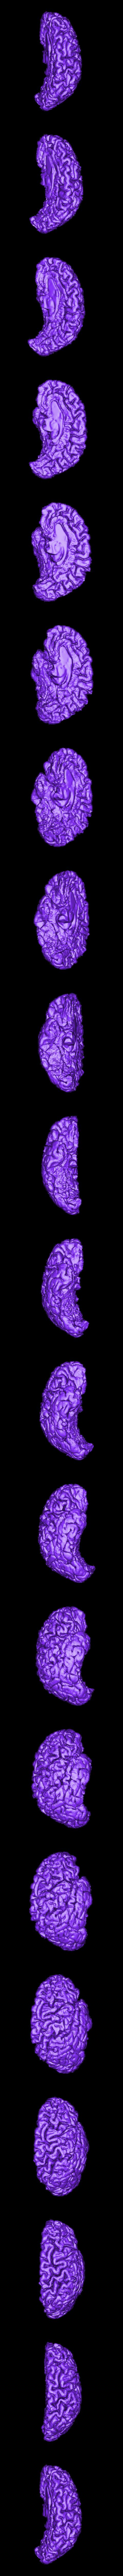 rh.stl Download STL file mri brain • Model to 3D print, Medhat